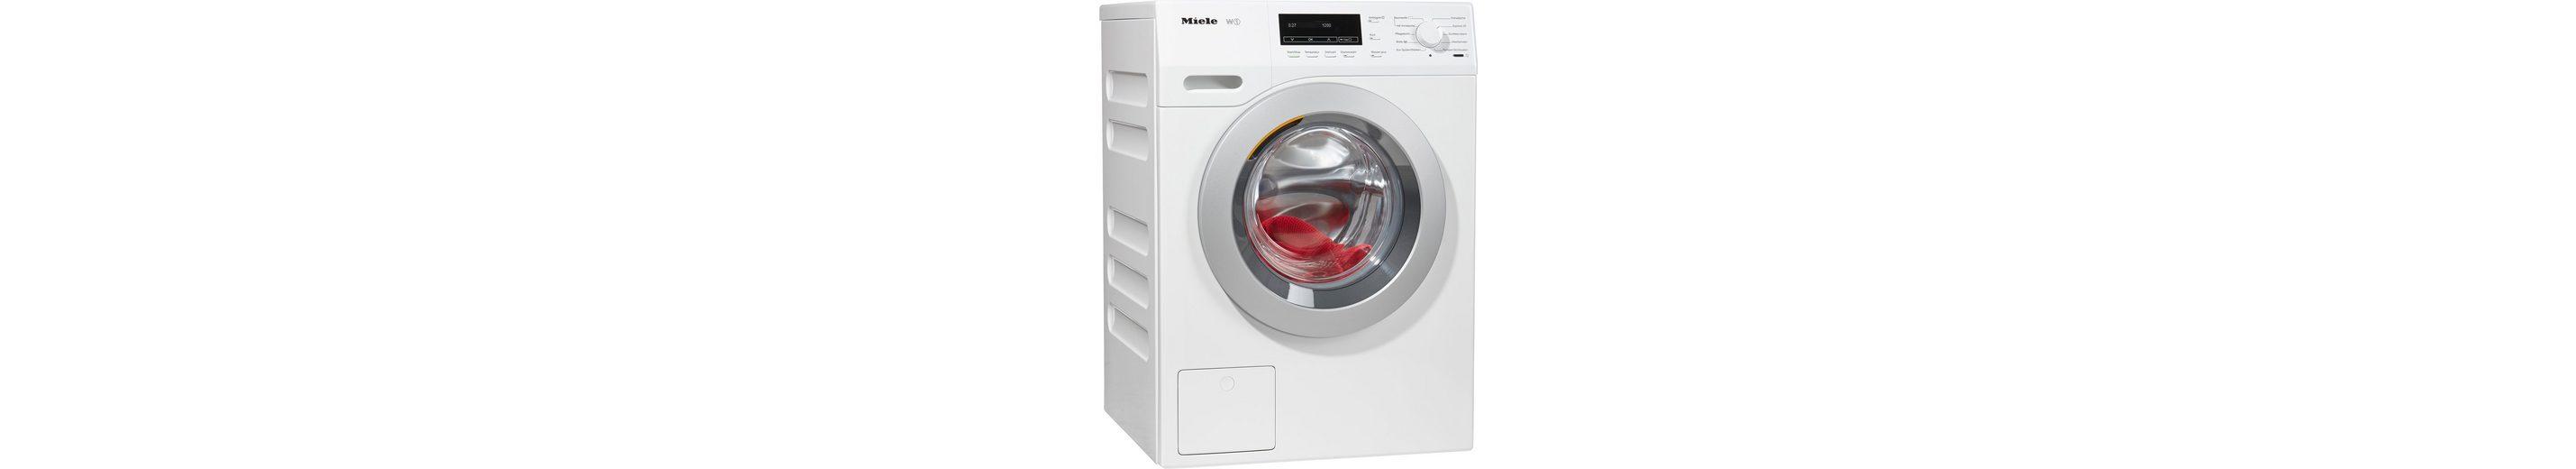 MIELE Waschmaschine WKB 130 WPS, A+++, 8 kg, 1600 U/Min